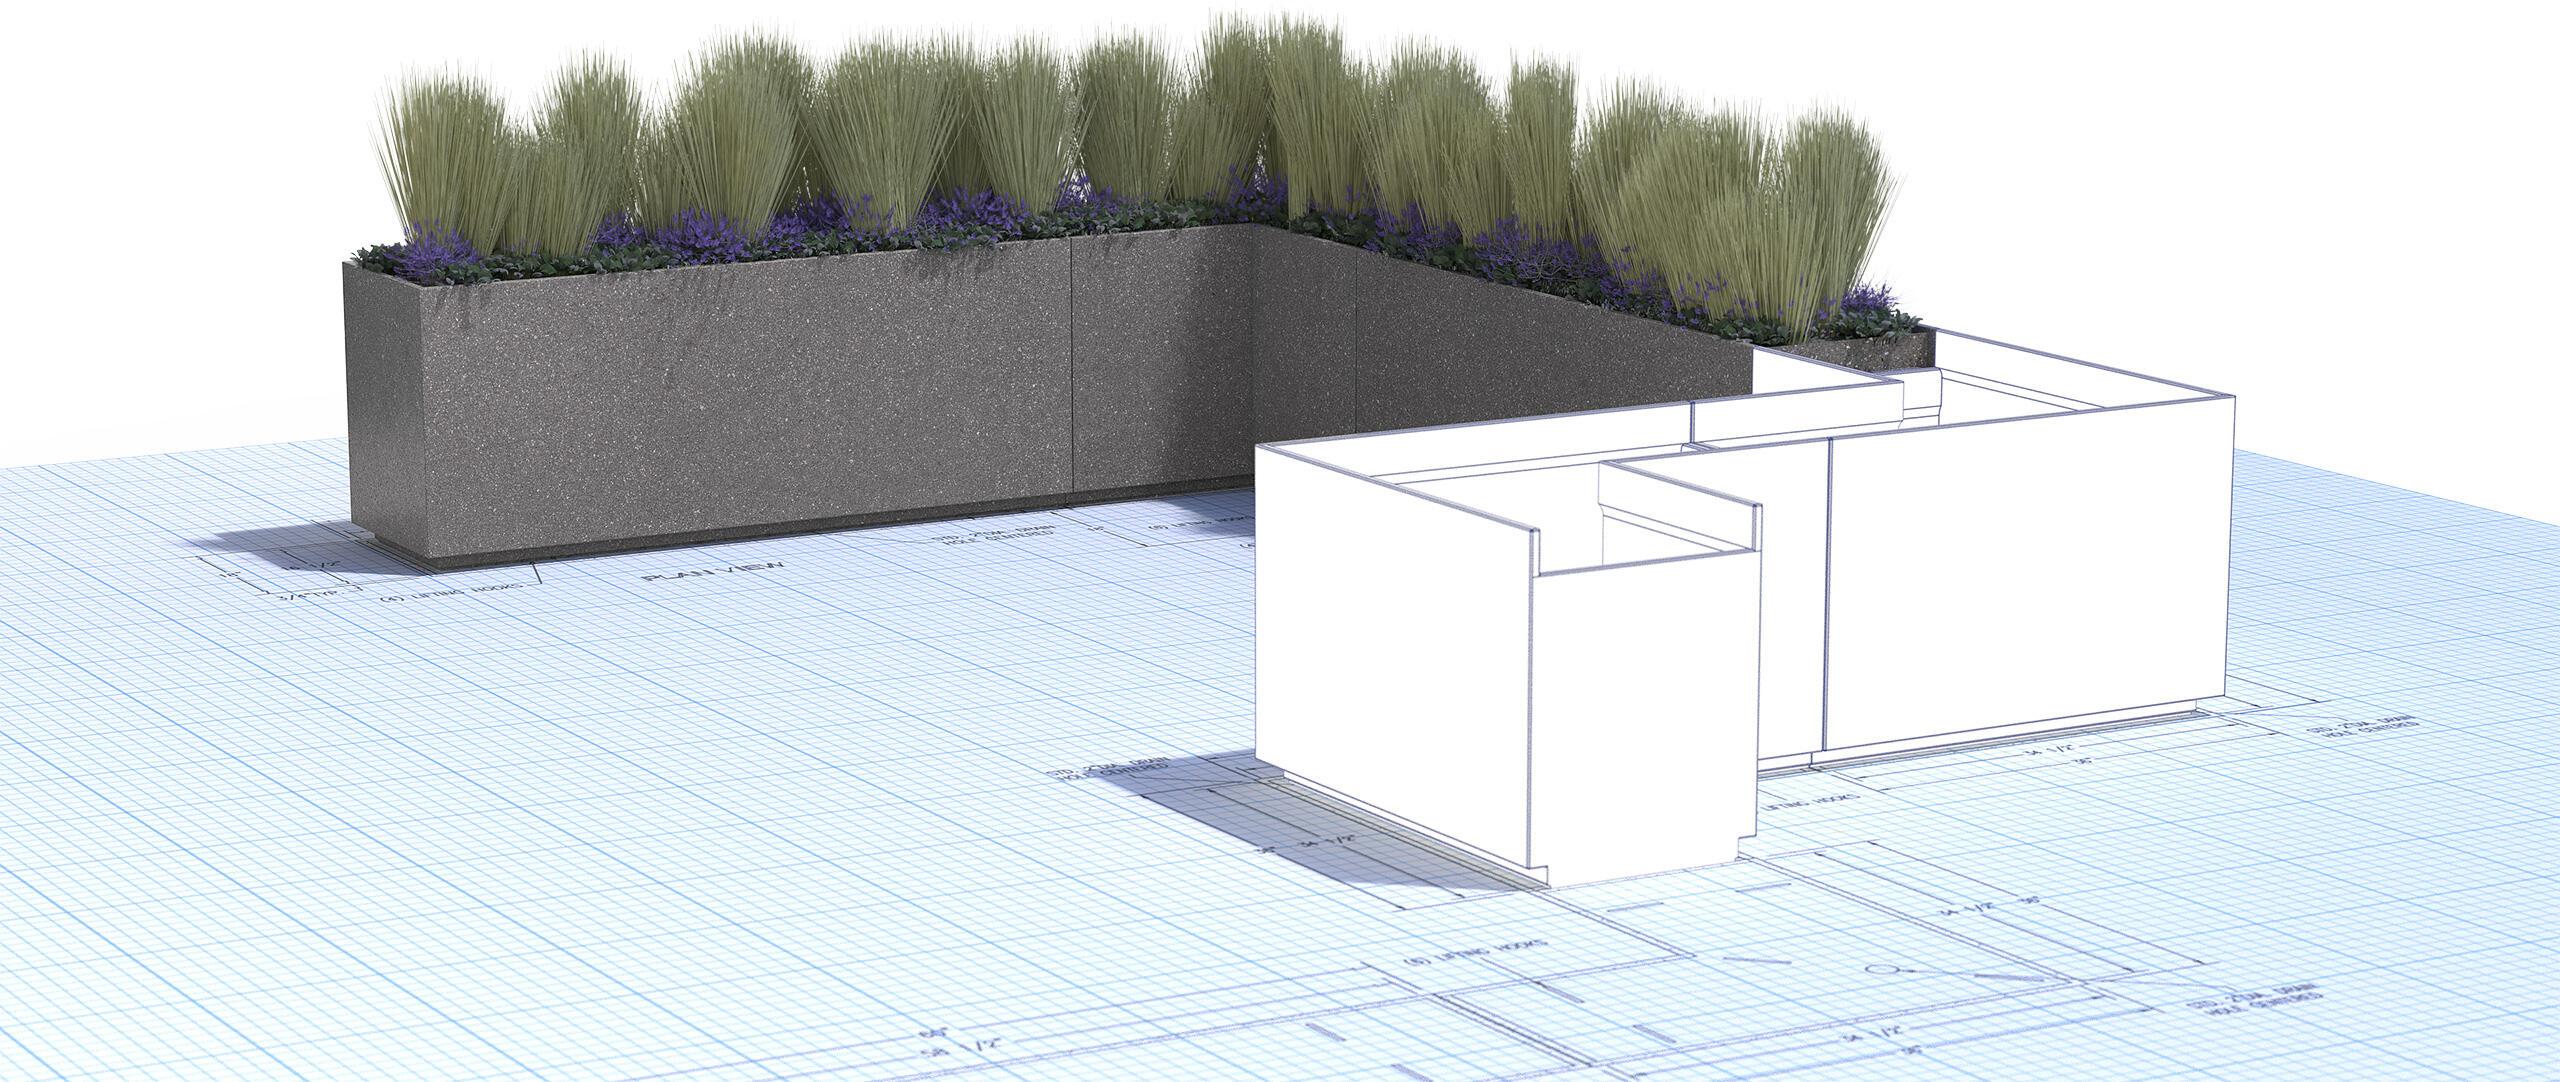 Concrete Architectural Amenities Furniture Commercial Pavers